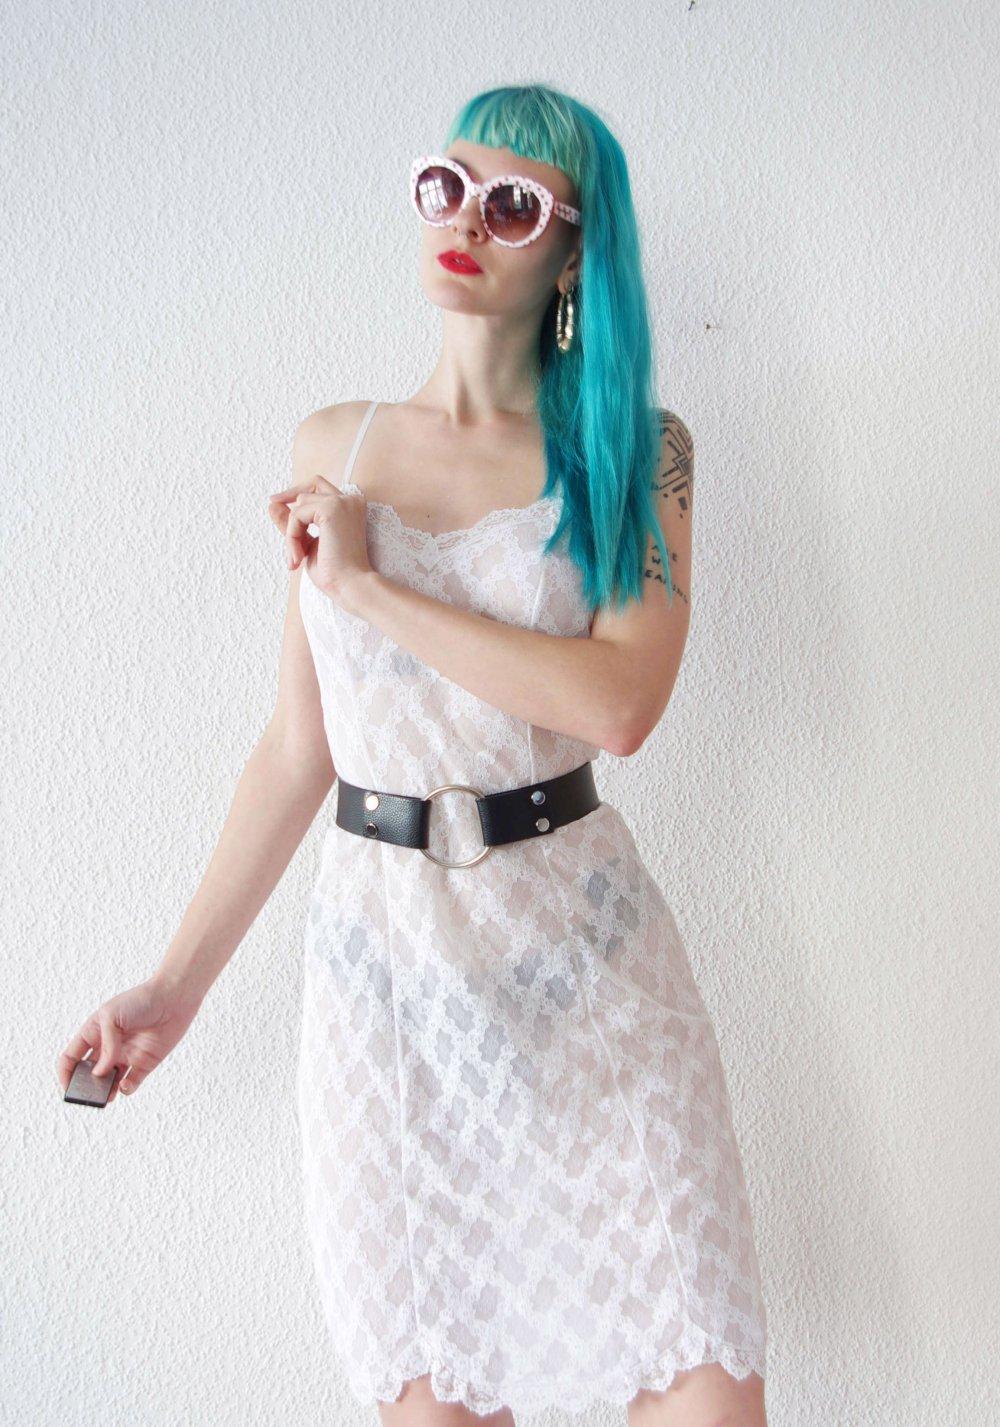 Zara Camisole doppellagig {NEU} Kleiderkreisel